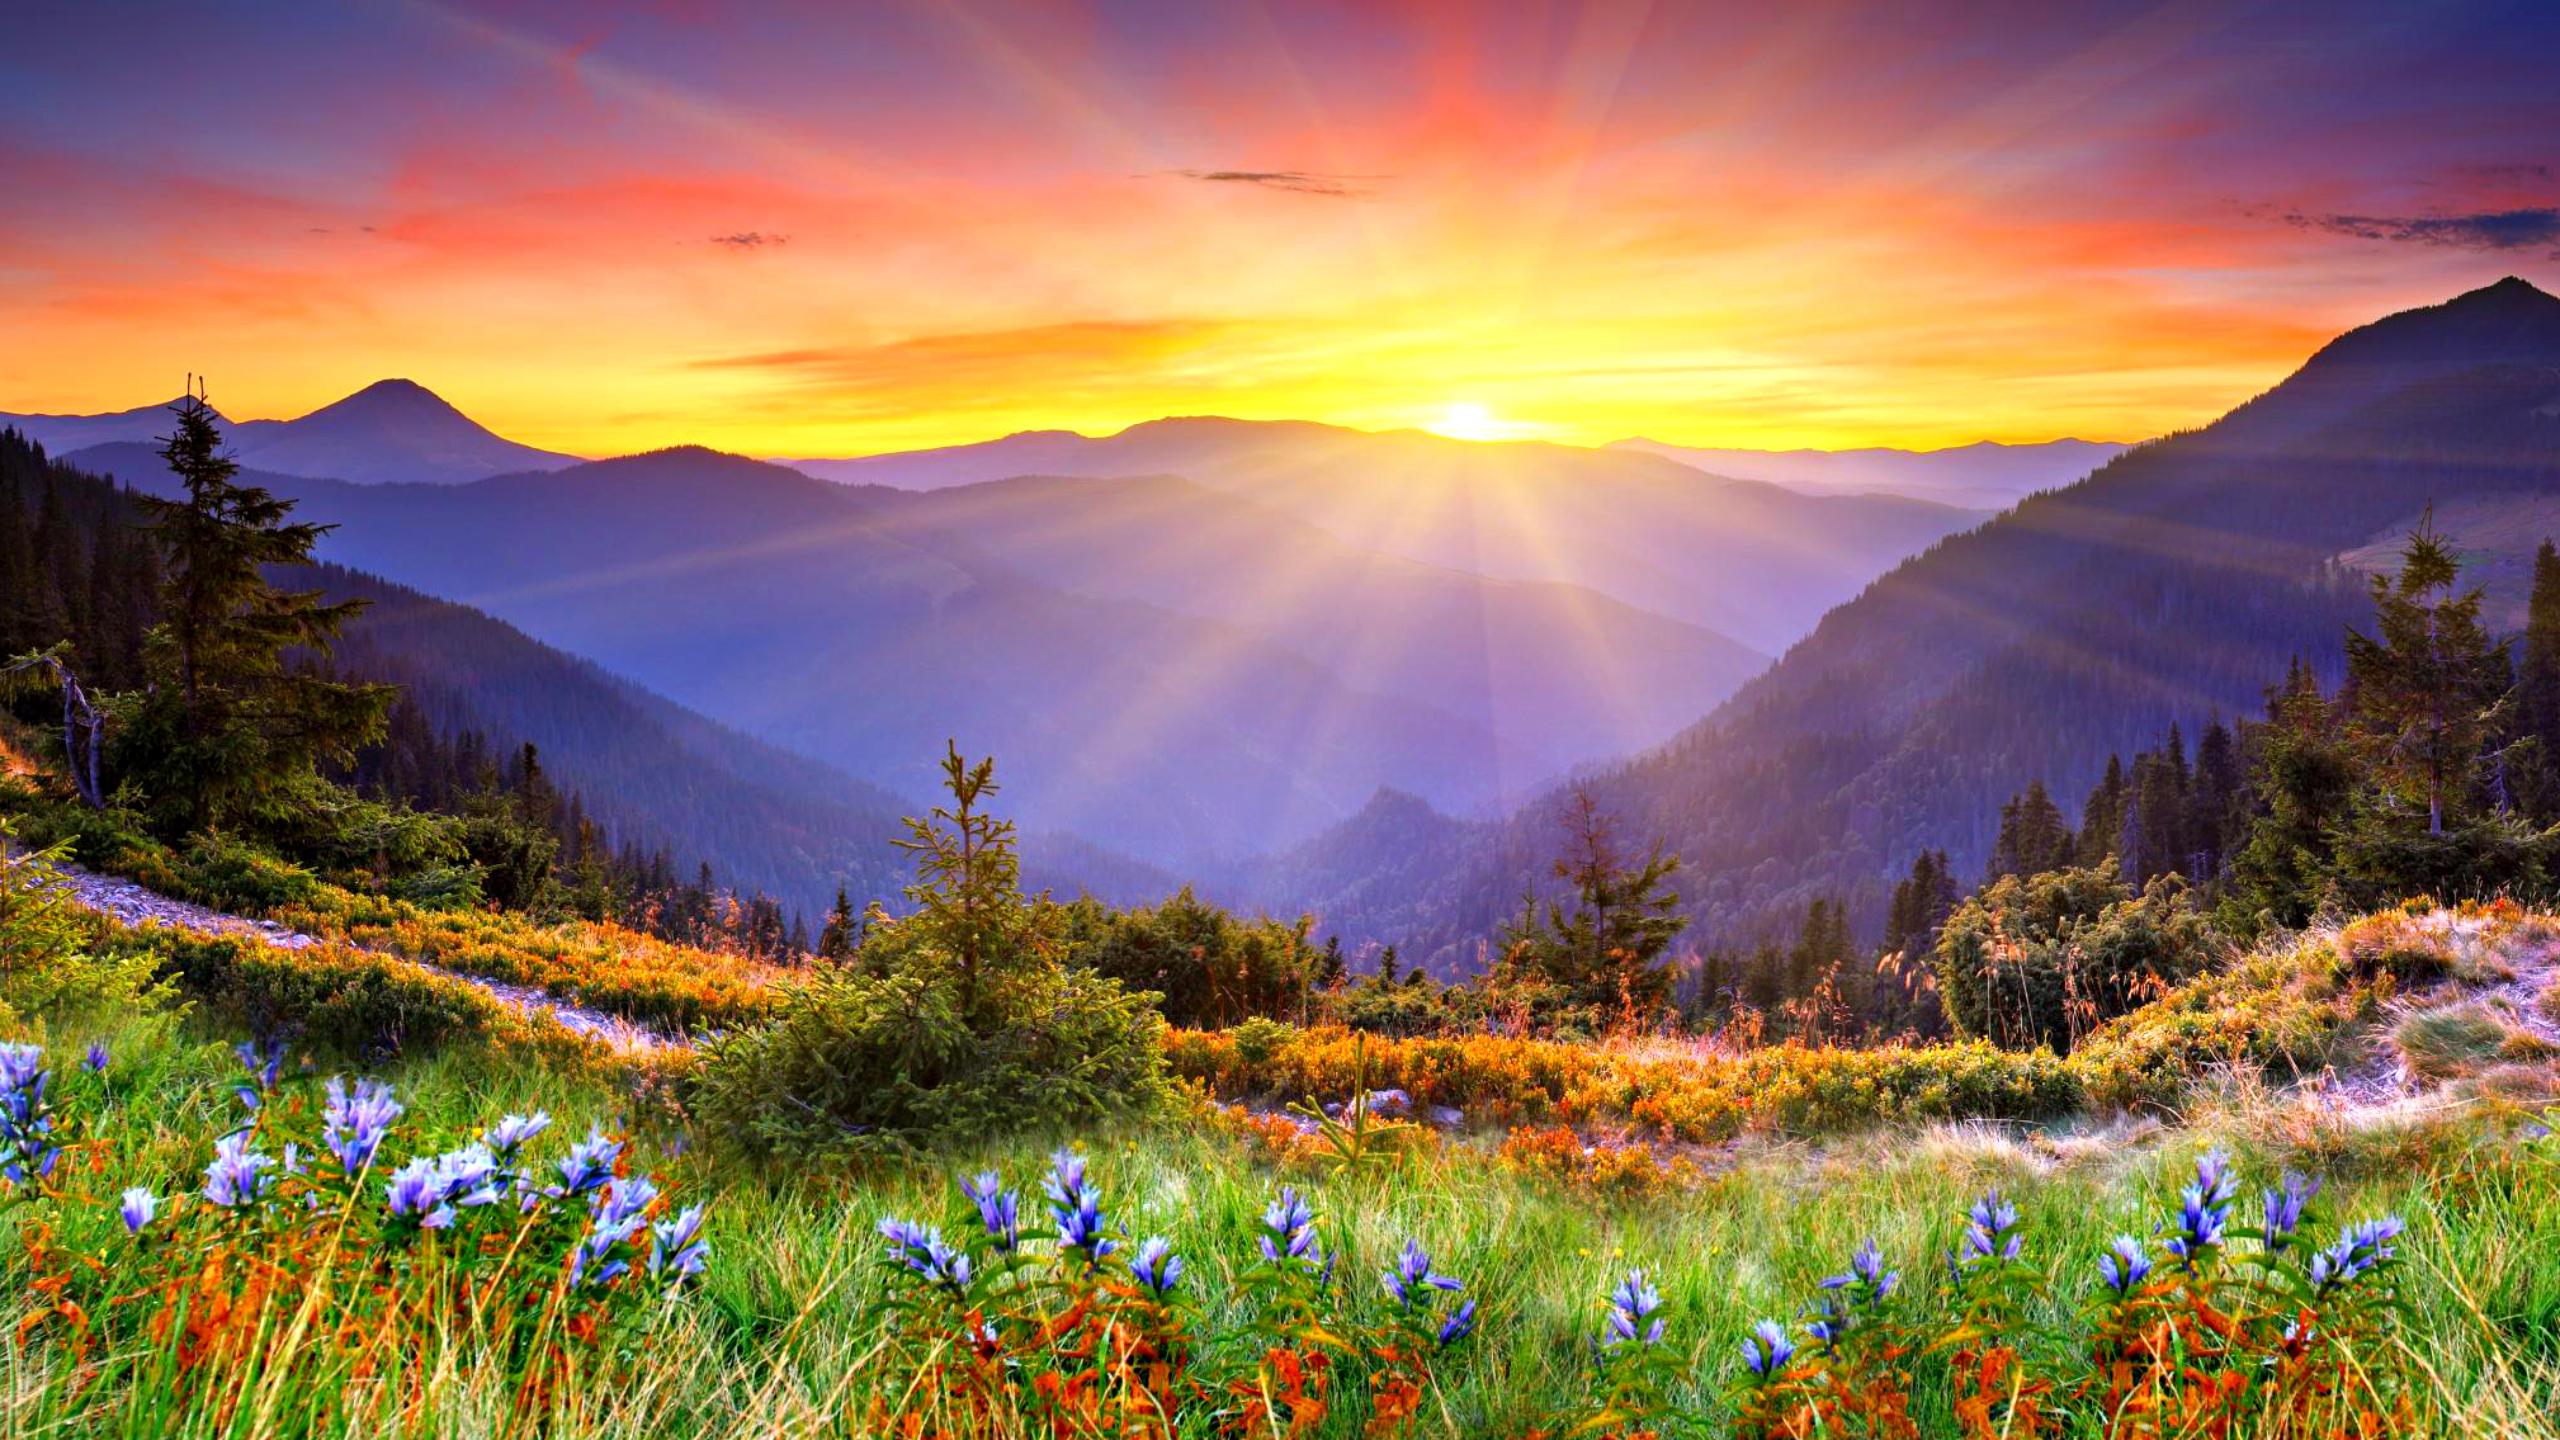 Nature & Landscape Beautiful Sun Rise wallpapers (Desktop, Phone ...